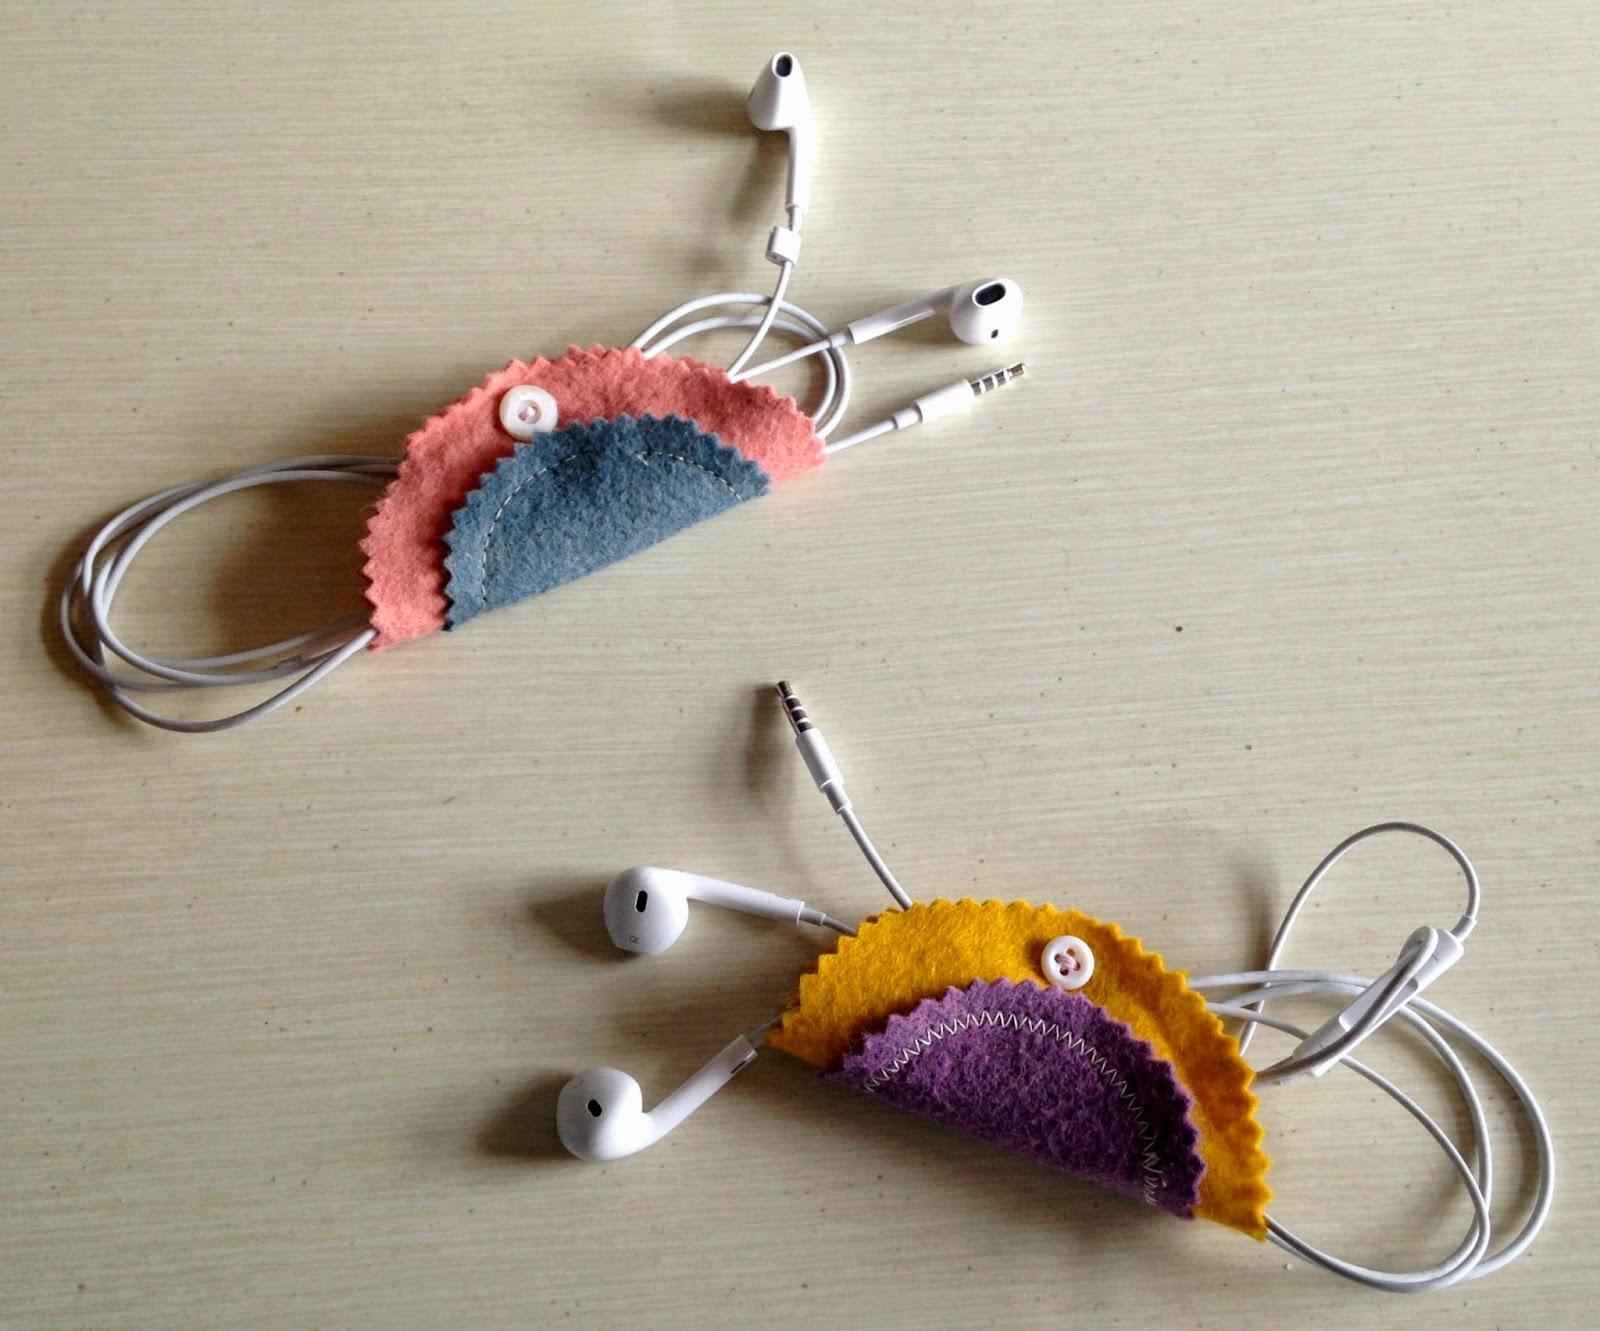 DIY colorful felt ear bud holder with a button